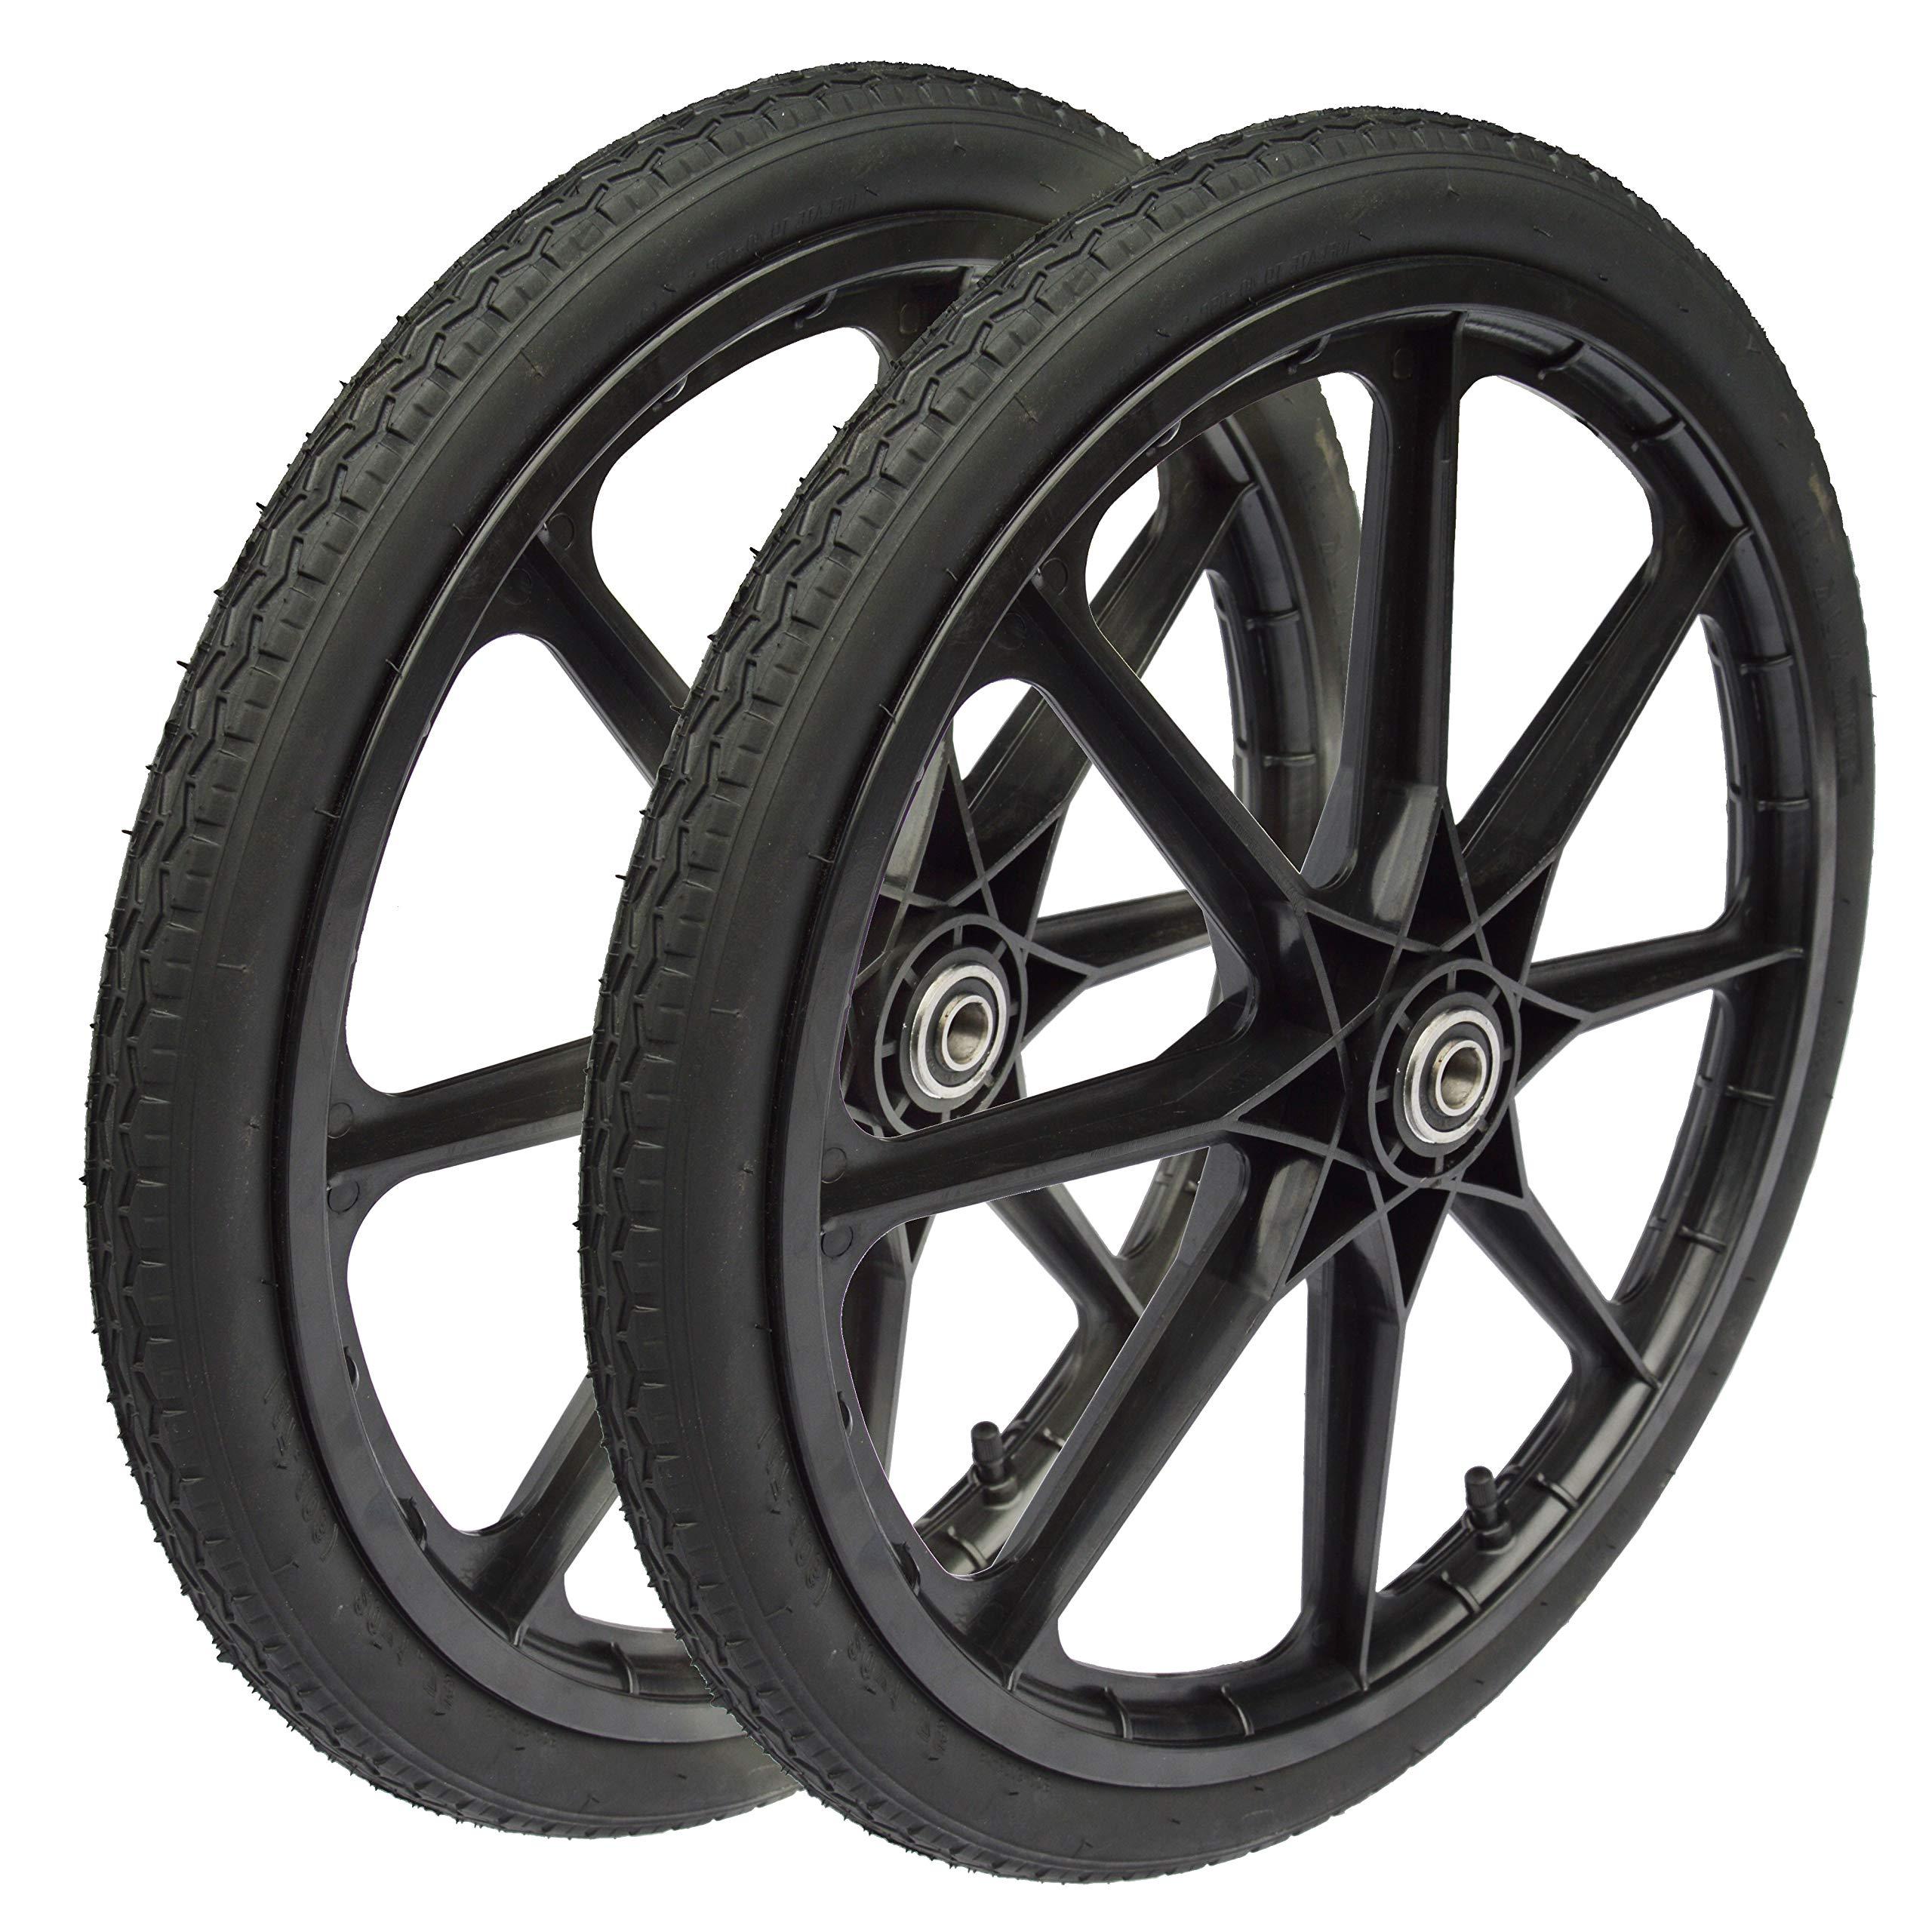 amarillo RimSavers Se adapta a ruedas de hasta 22 pulgadas de di/ámetro